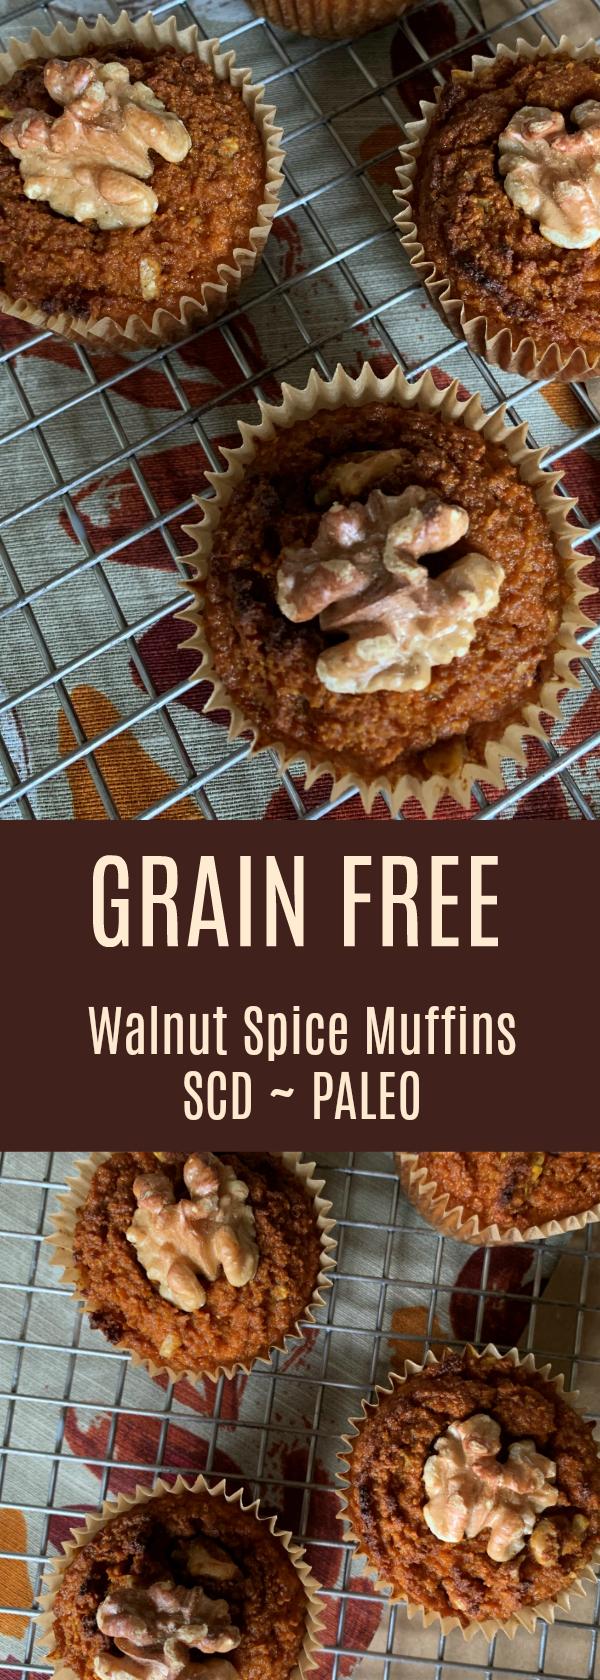 Grain Free Walnut Spice Muffins - SCD, Paleo, Dairy Free